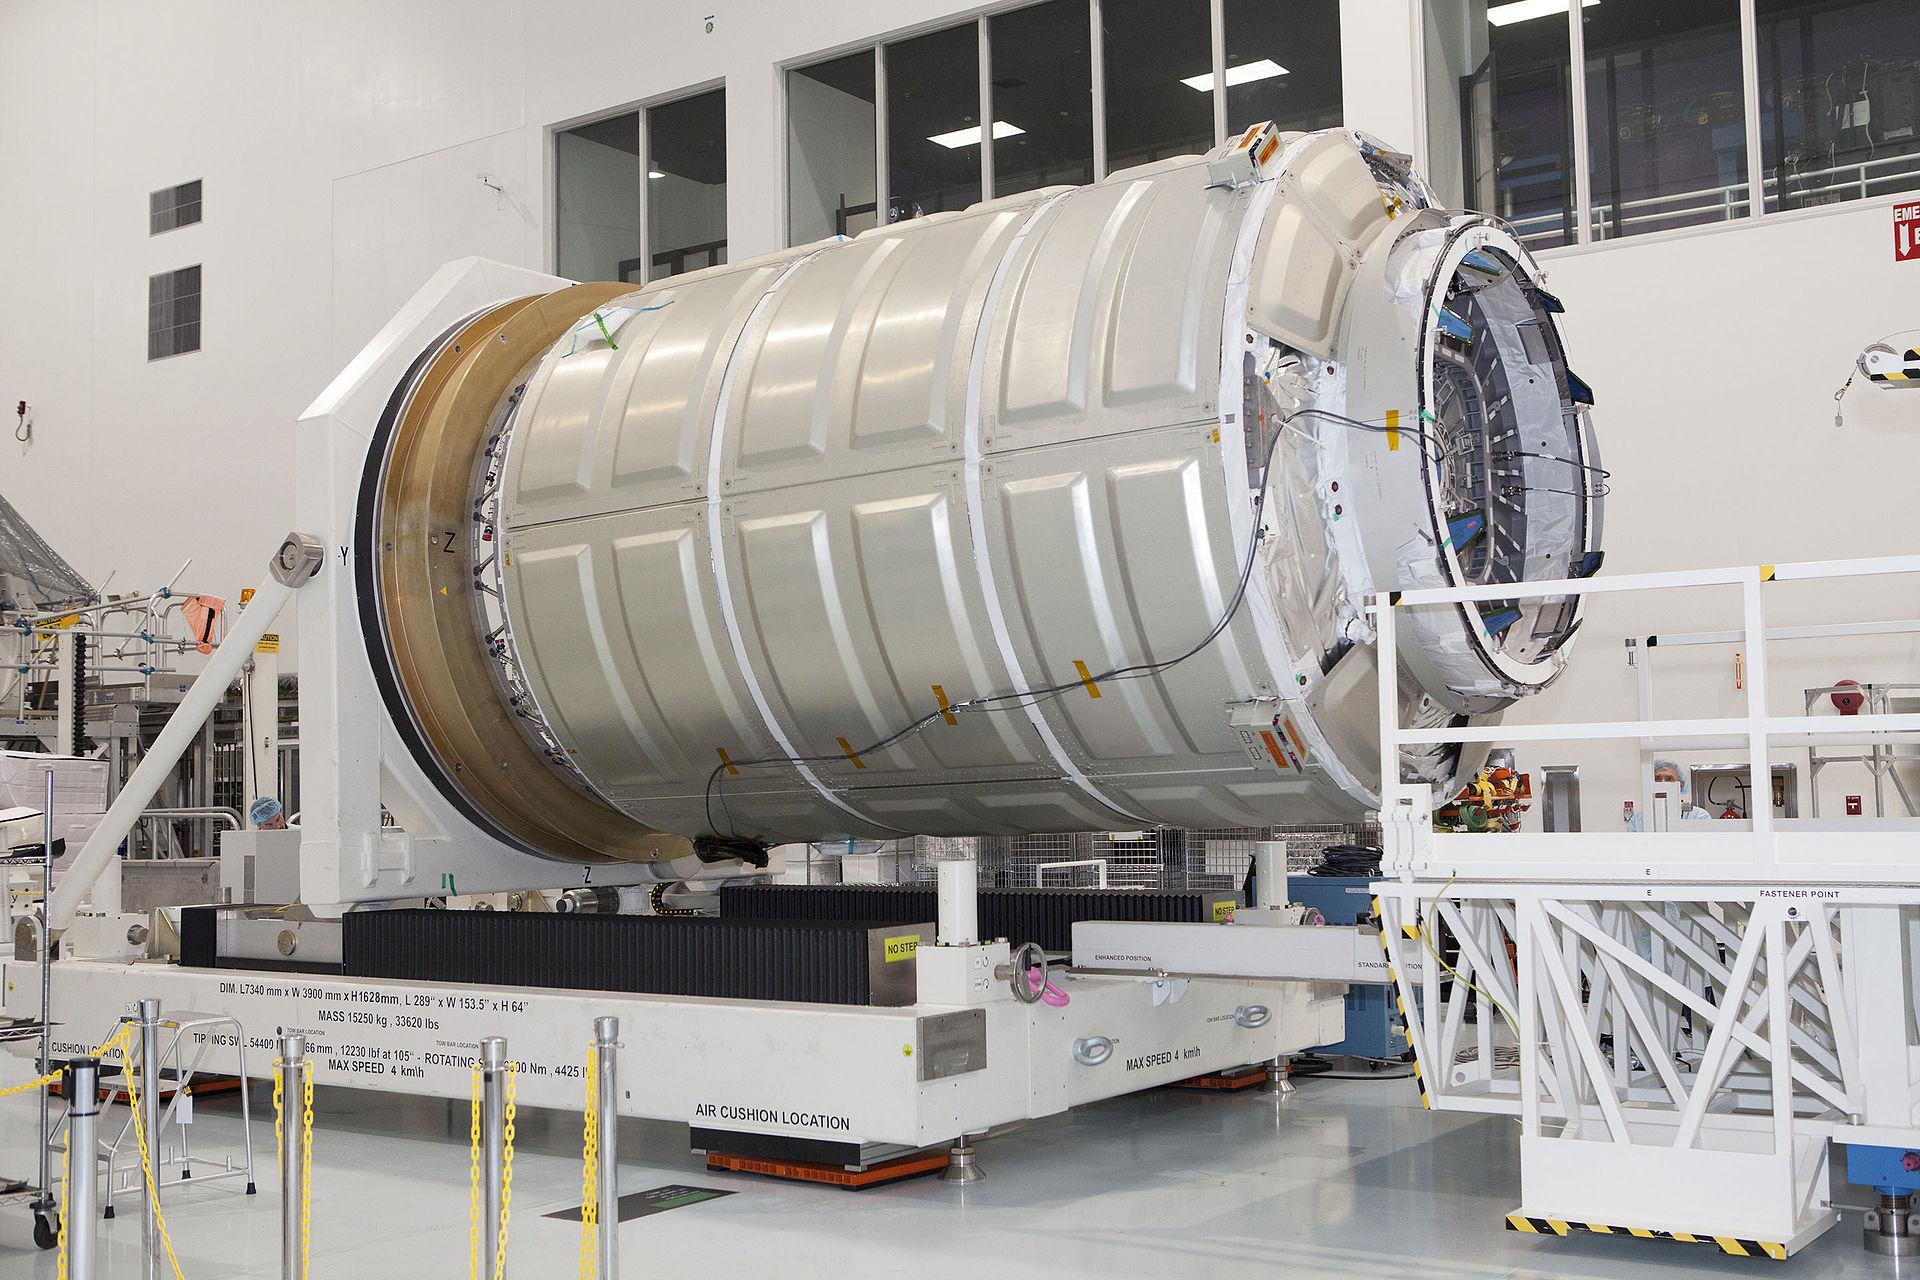 Cygnus module